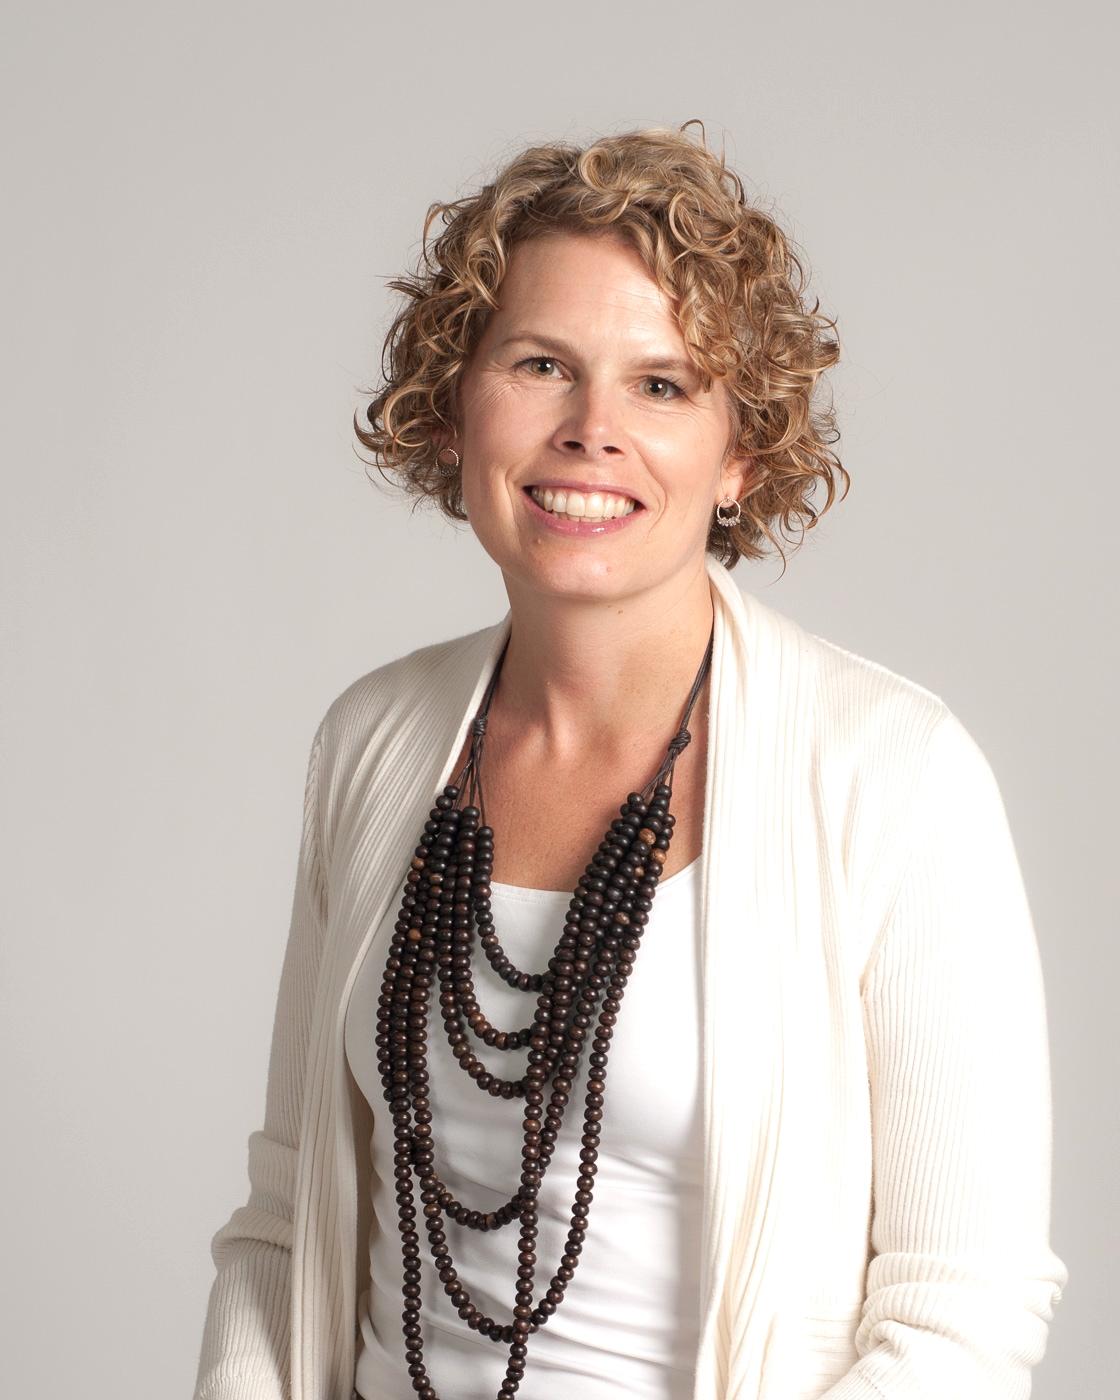 Lisa Servon - The New School